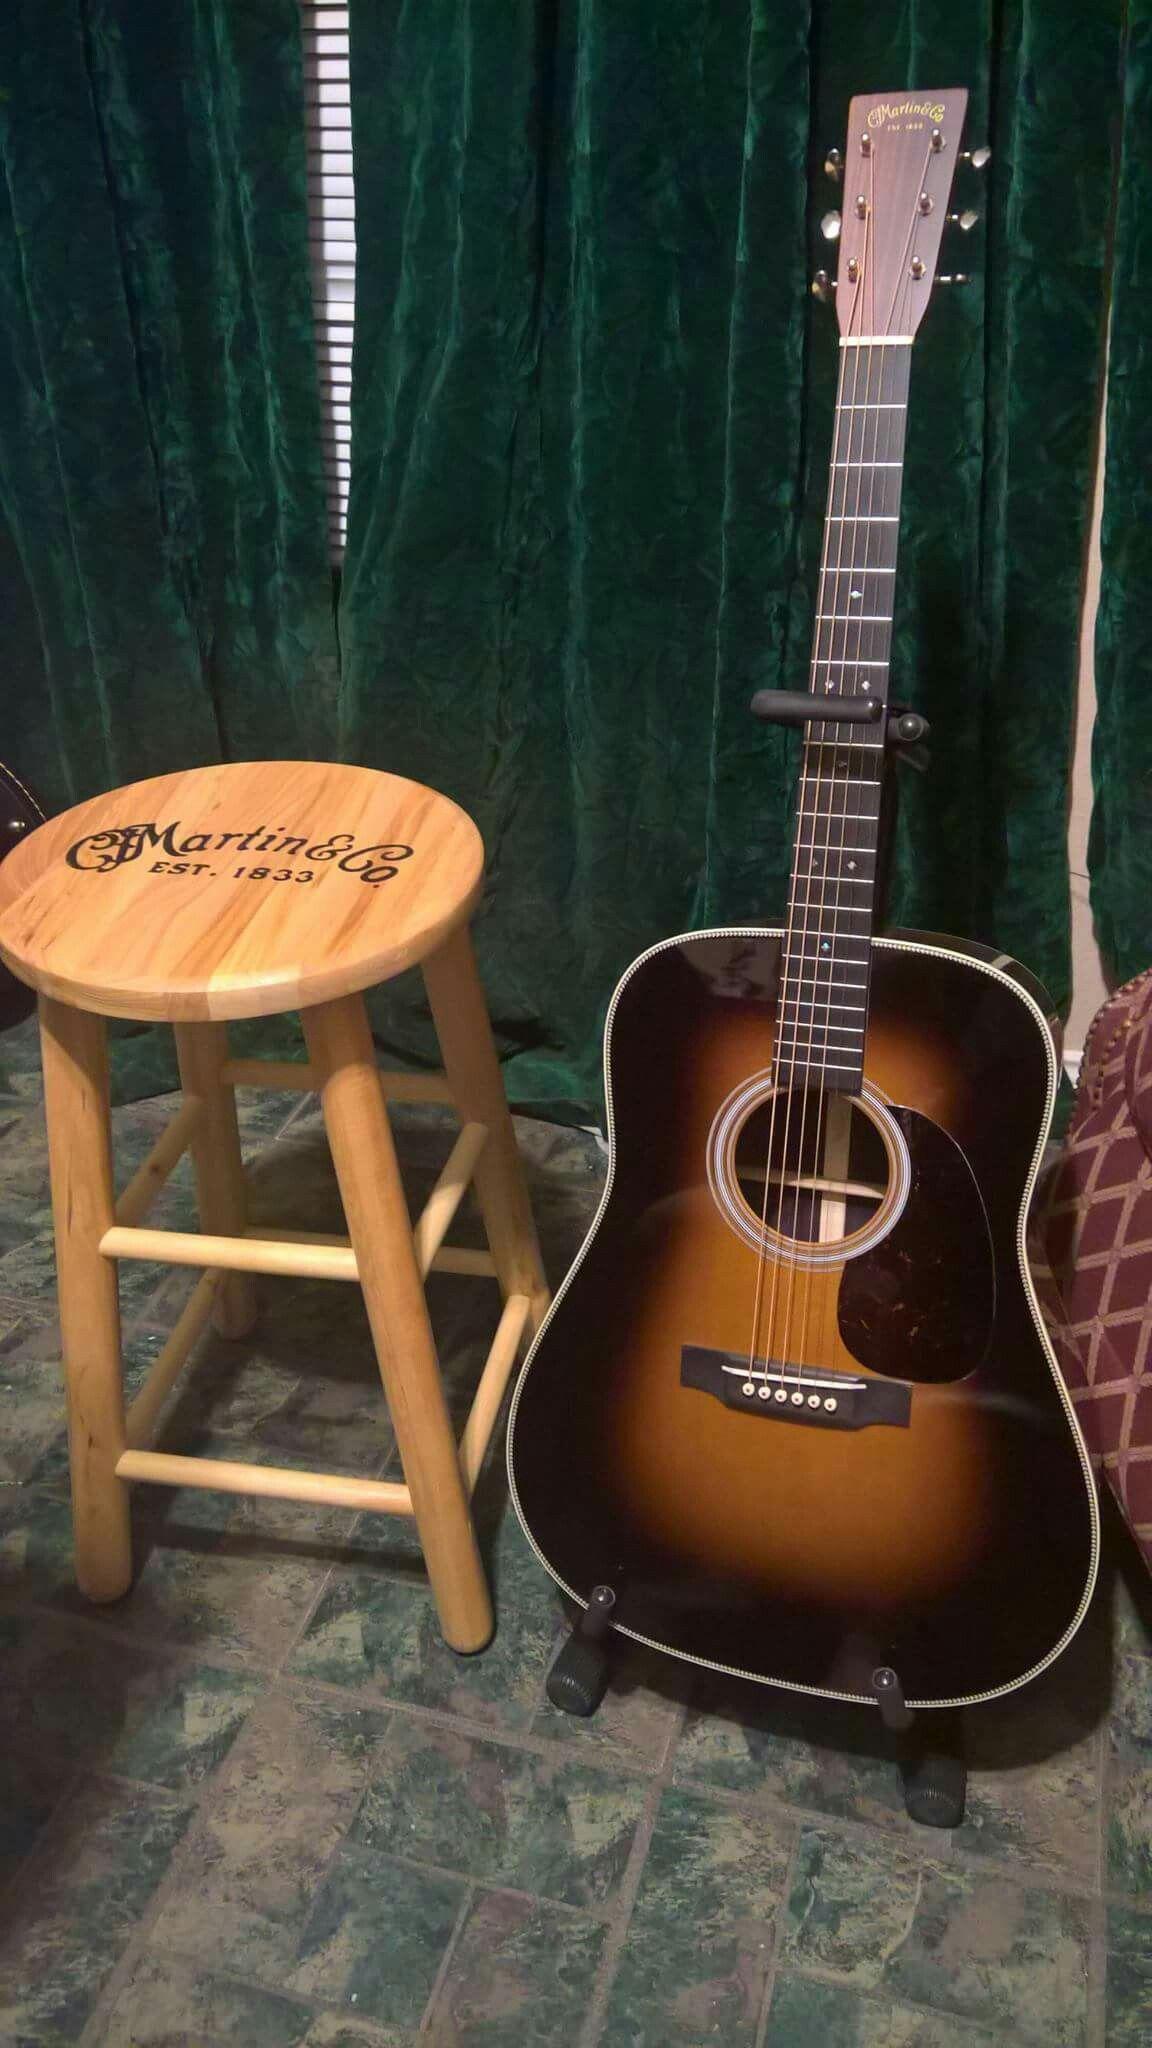 Martin Acoustic guitarcenteracoustic Martin guitar